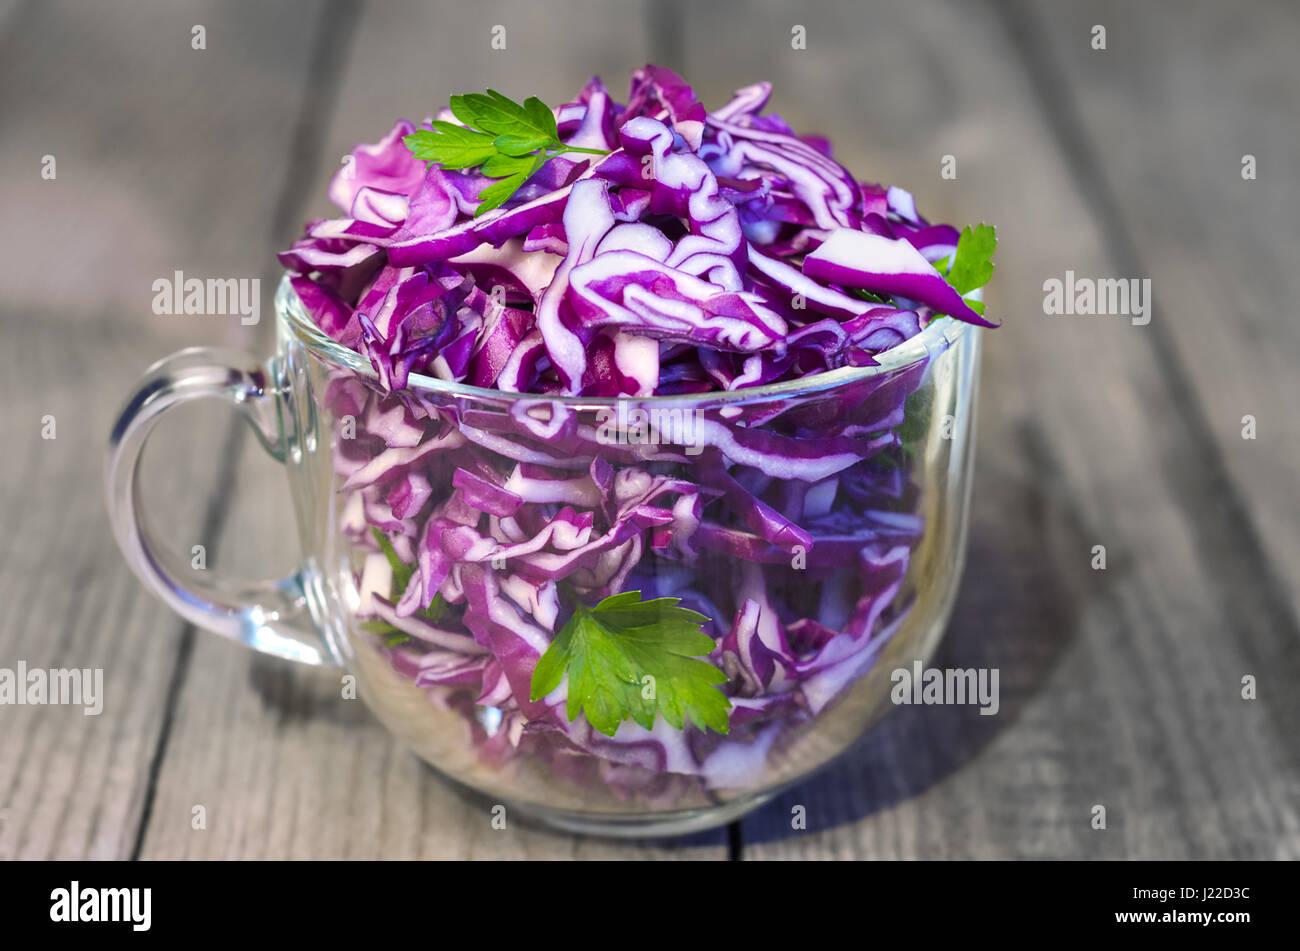 Salat mit Rotkohl. Hölzerne Hintergrund, selektiven Fokus Stockbild